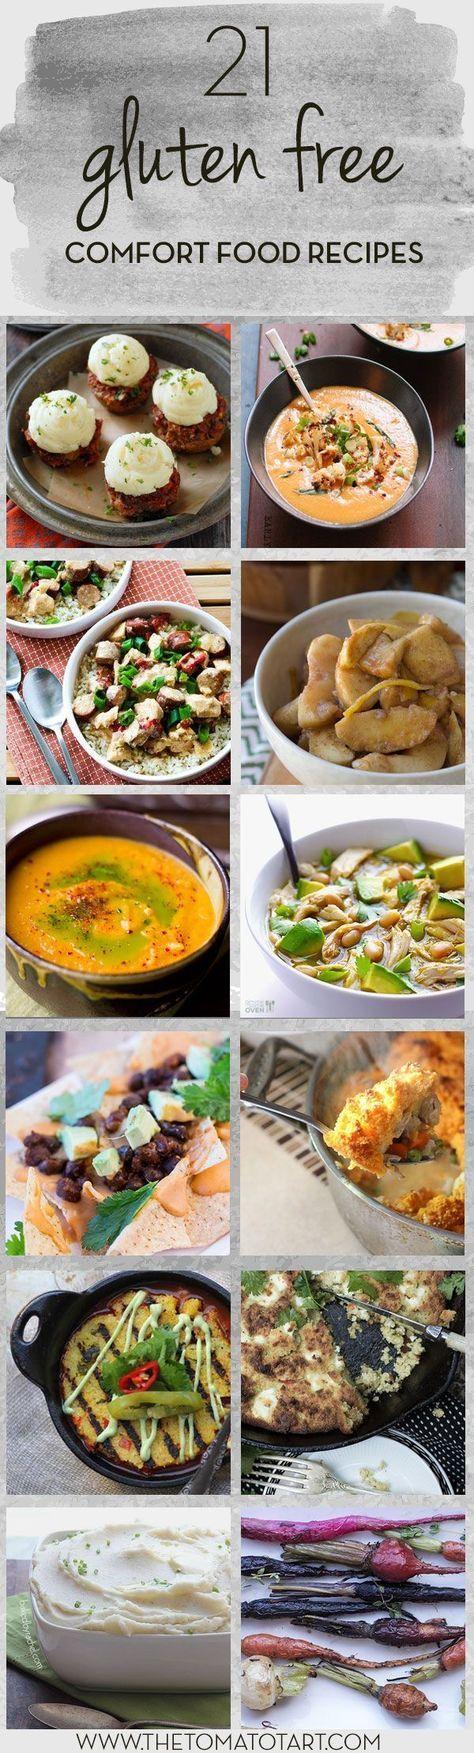 21 Gluten Free Comfort Food Recipes